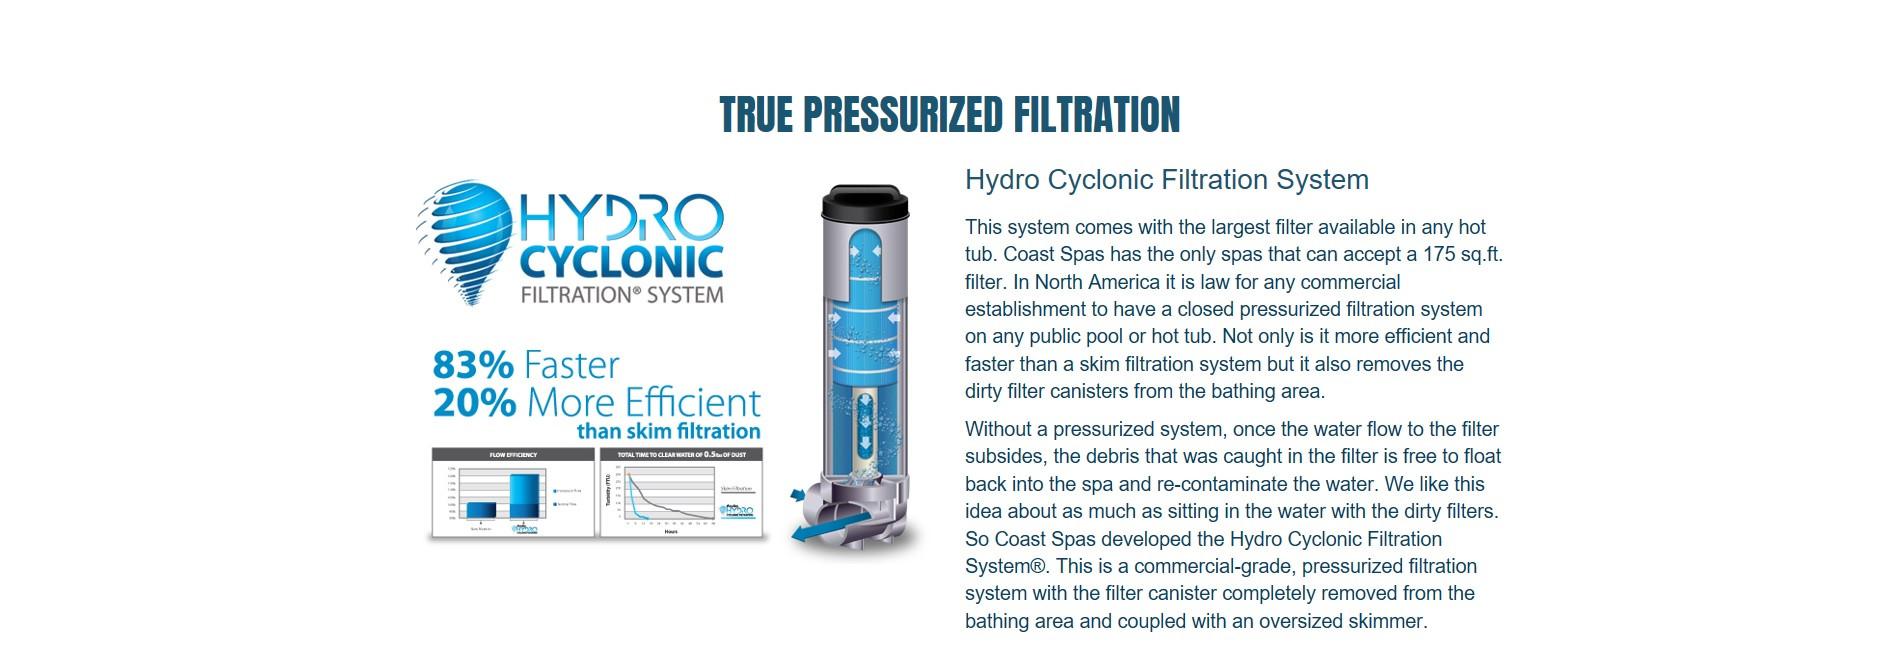 Hydrocyclonic filtration.jpg